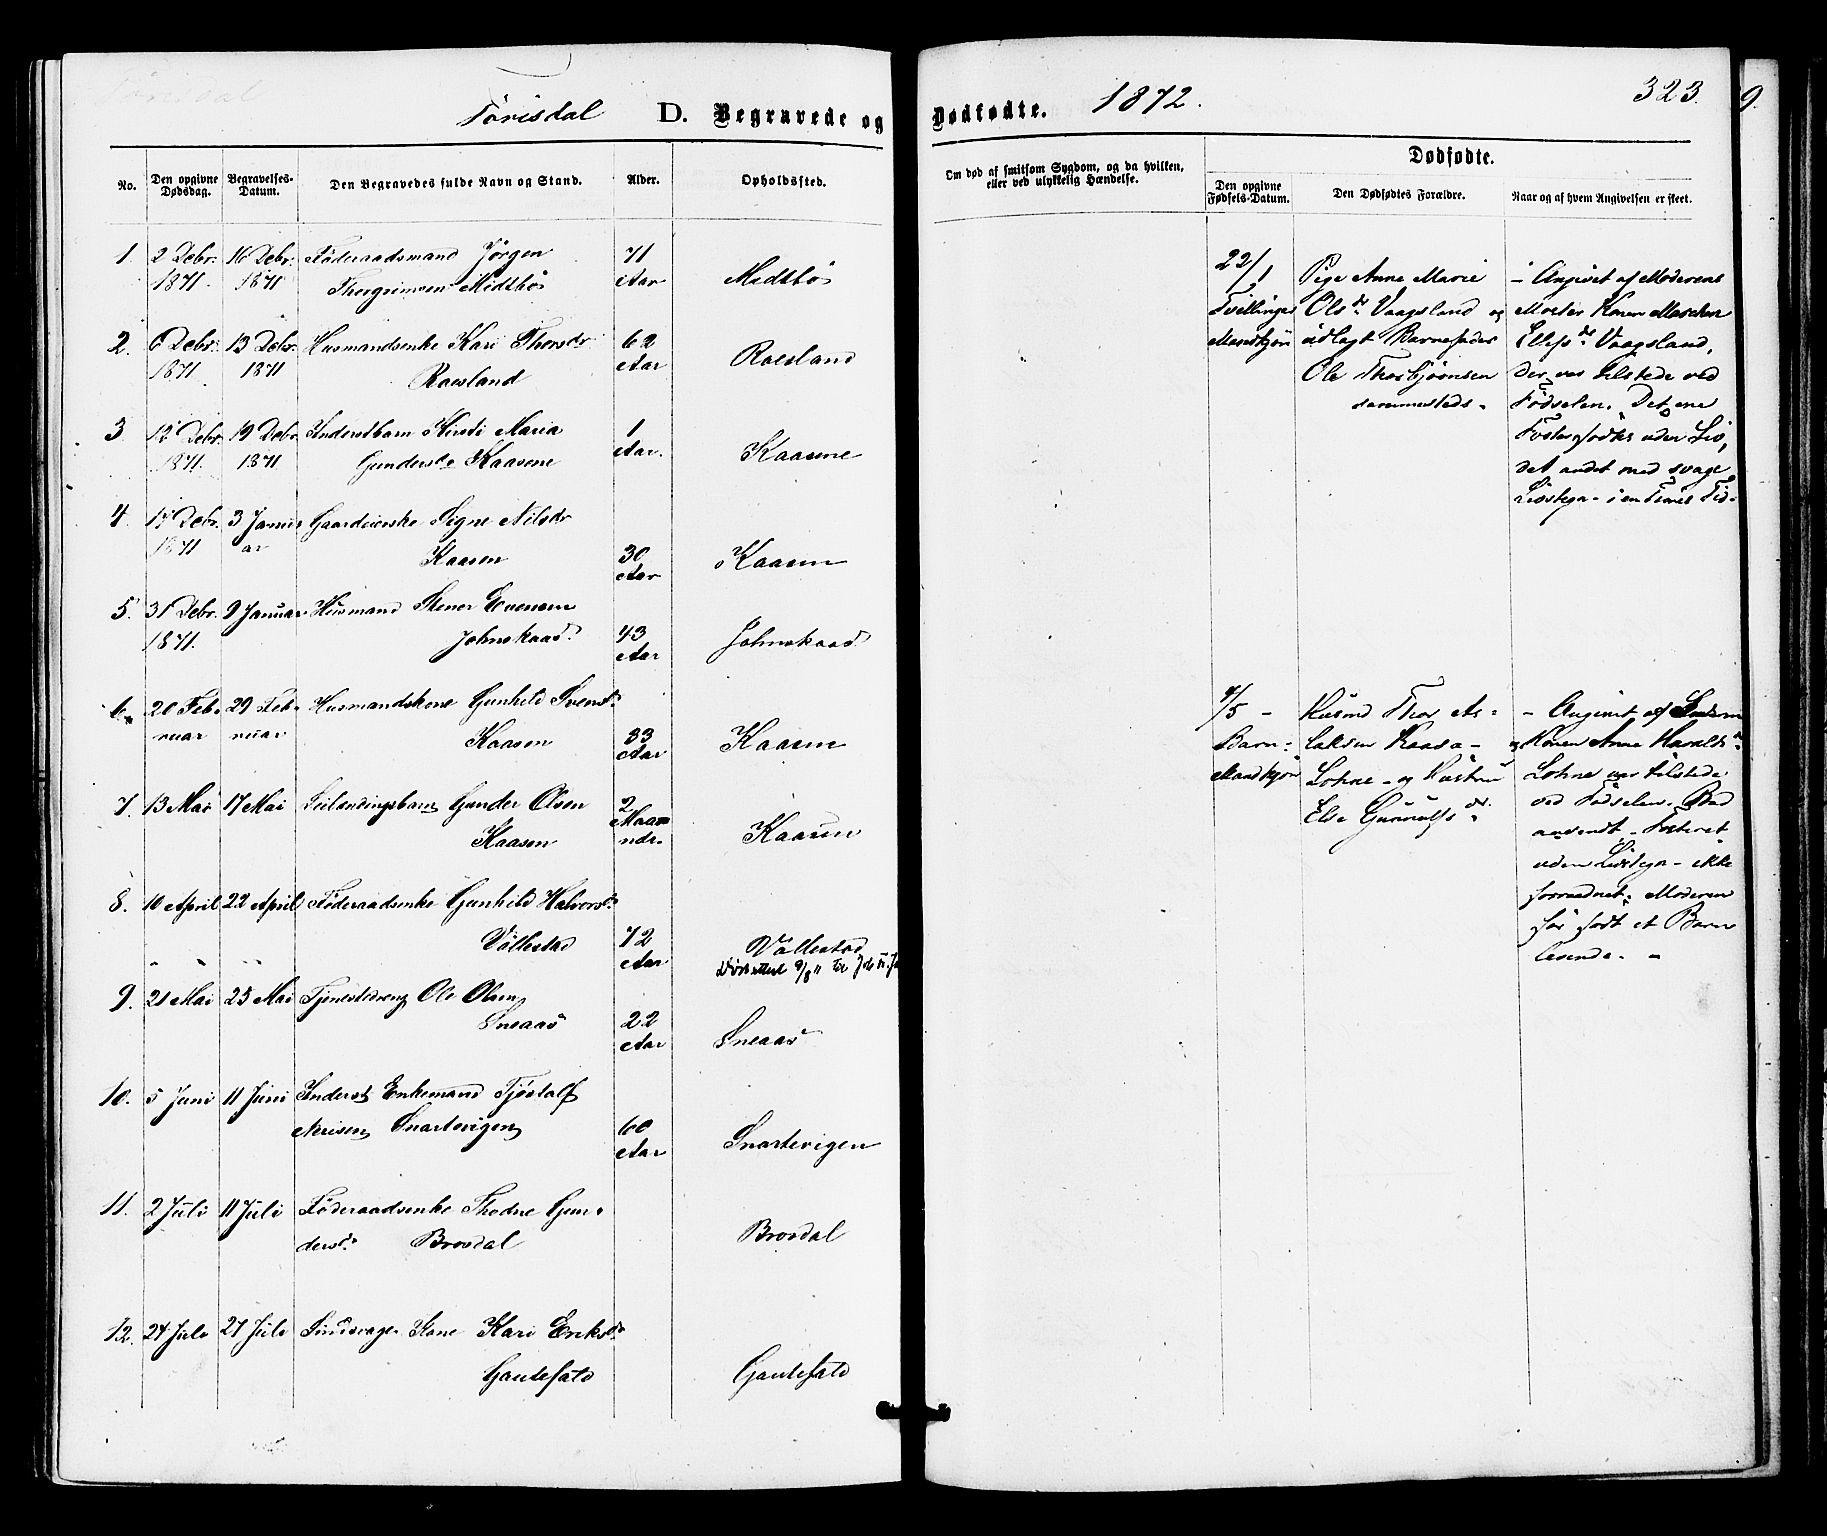 SAKO, Drangedal kirkebøker, F/Fa/L0009: Ministerialbok nr. 9 /2, 1872-1884, s. 323